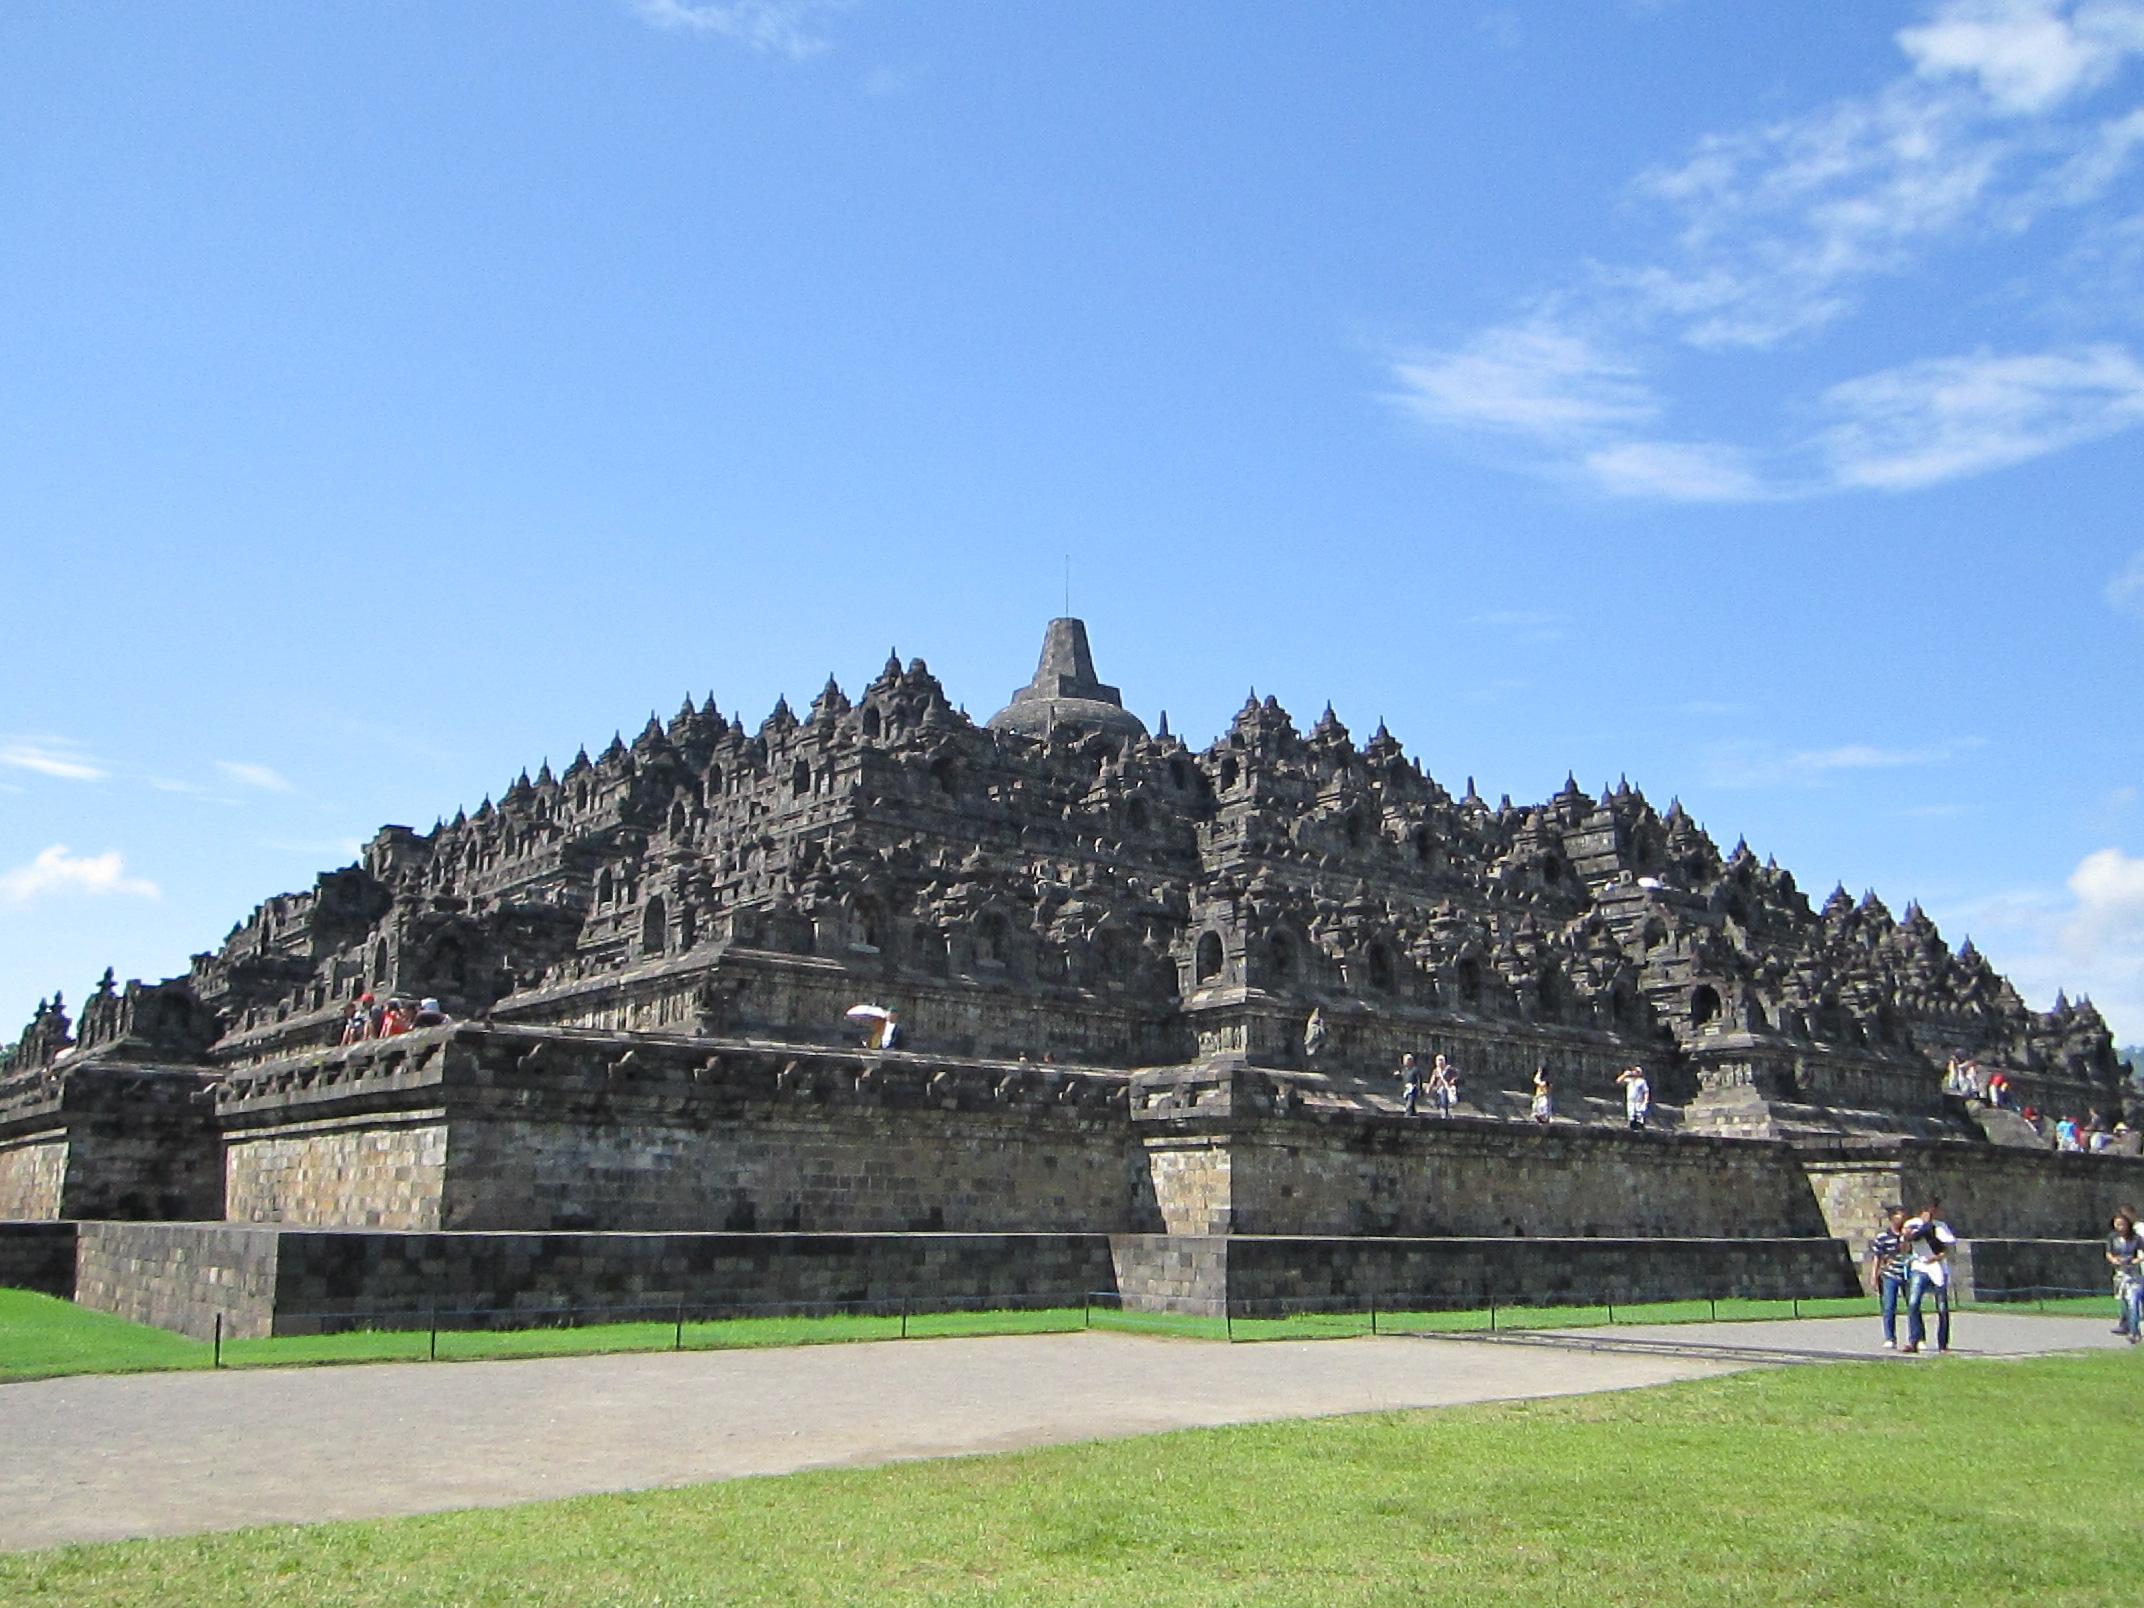 Jawa Tengah, Candi Borobudur, Magelang, Jogjakarta,